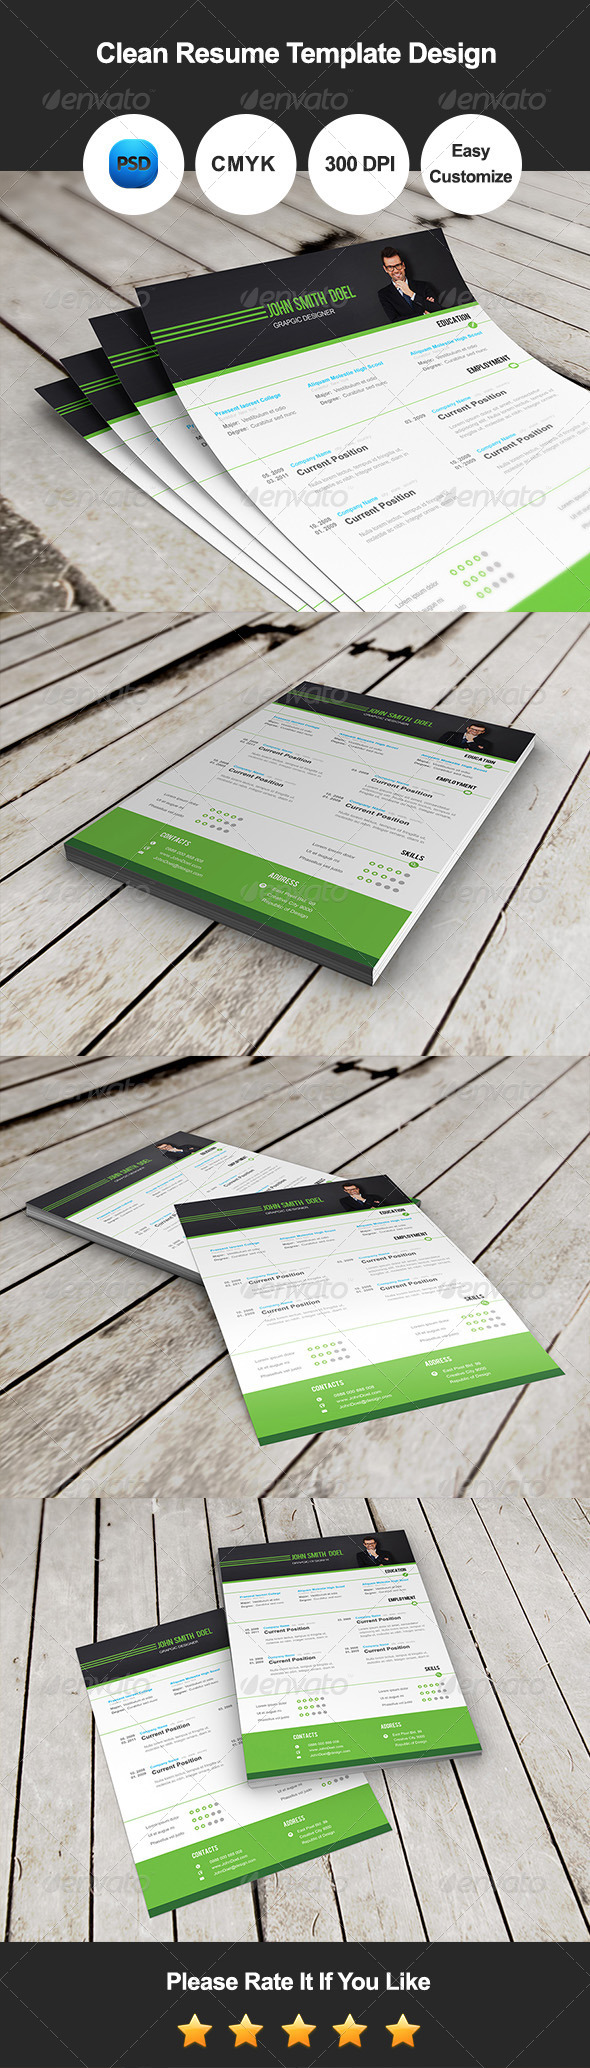 Clean Resume Template Design